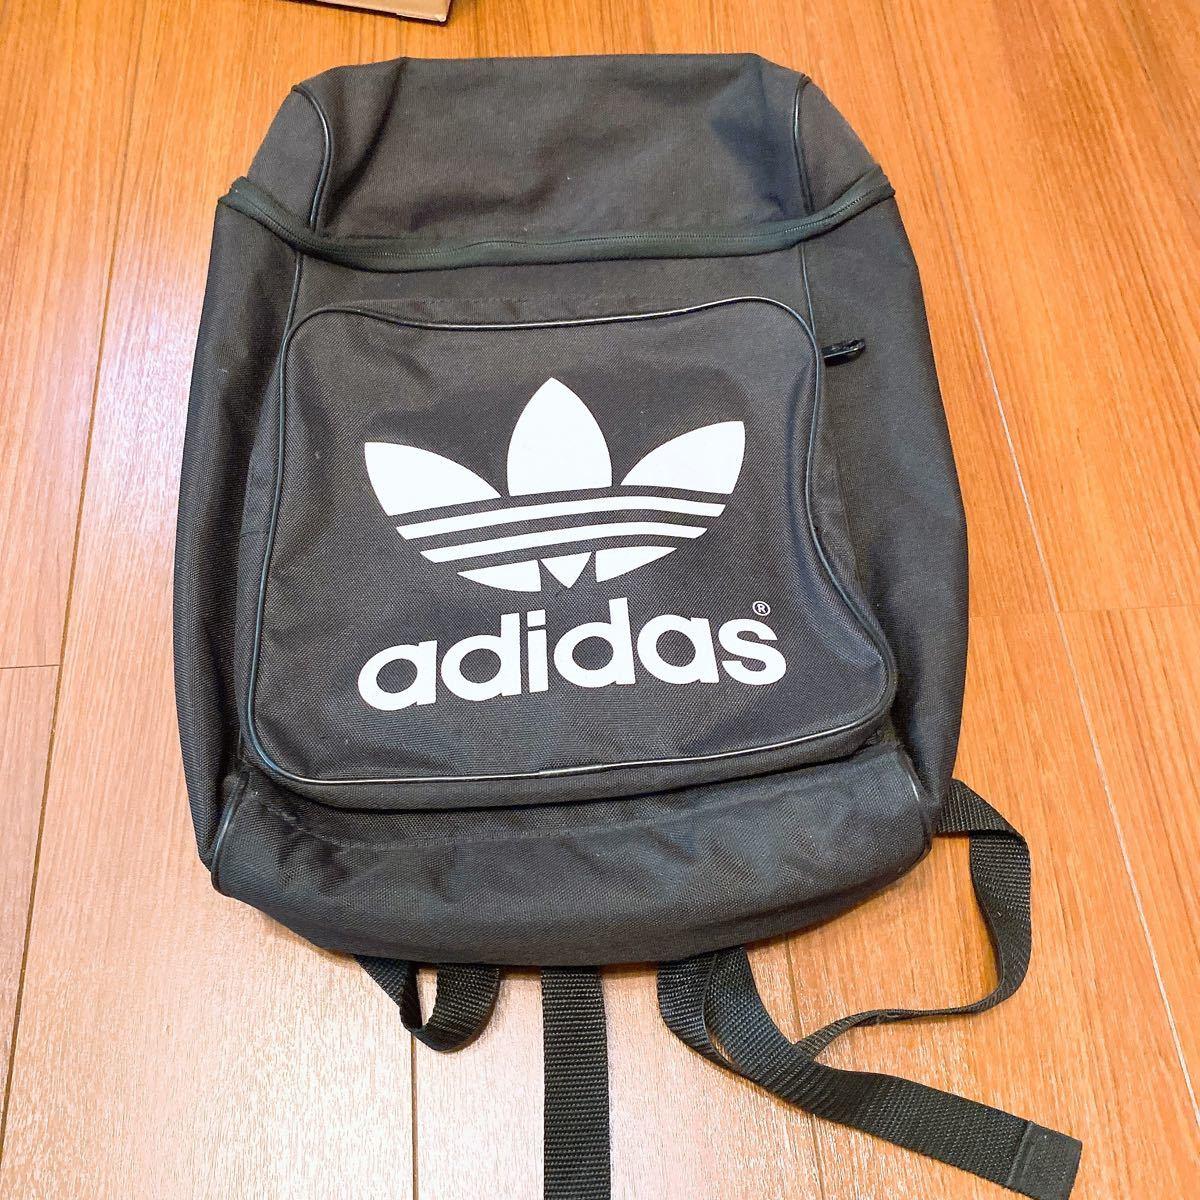 adidas originals アディダス リュック バックパック アディダスオリジナルス アディダスリュック リュックサック